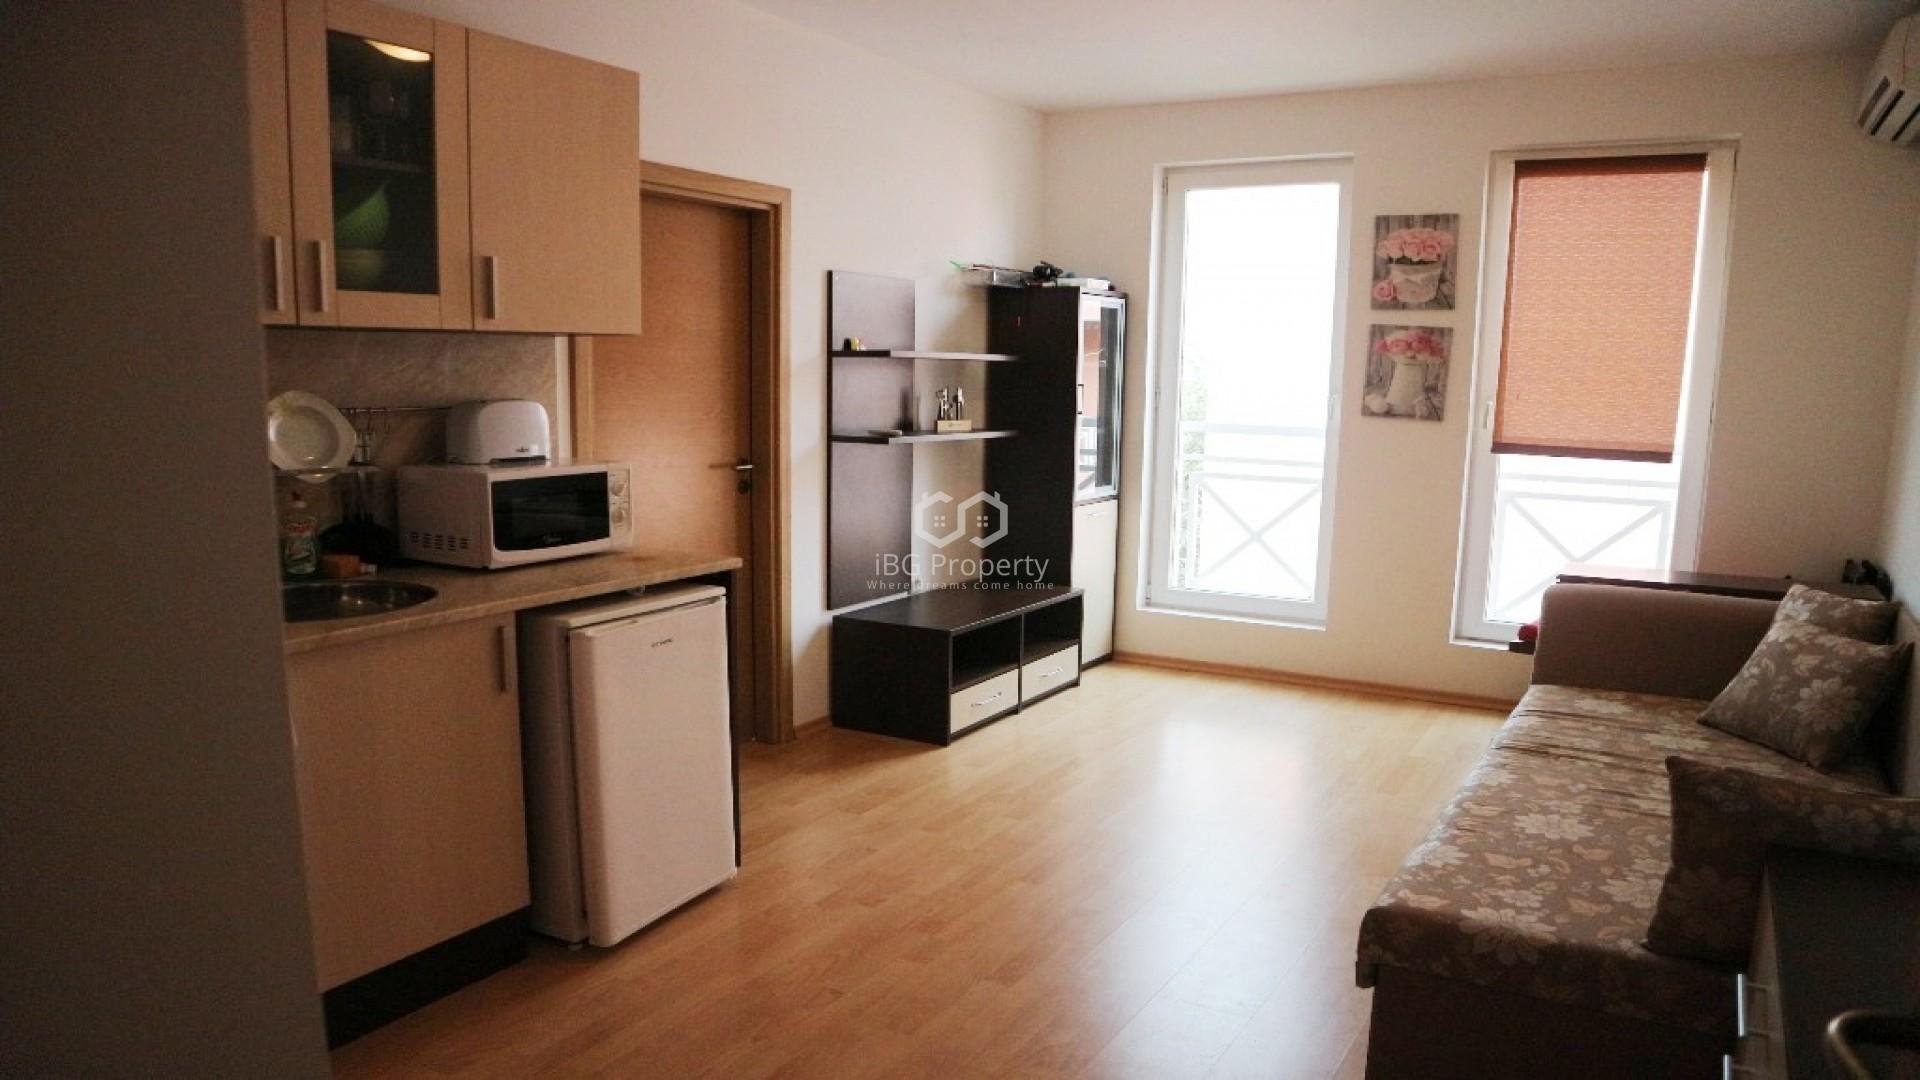 One bedroom apartment Sunny Beach 44 m2